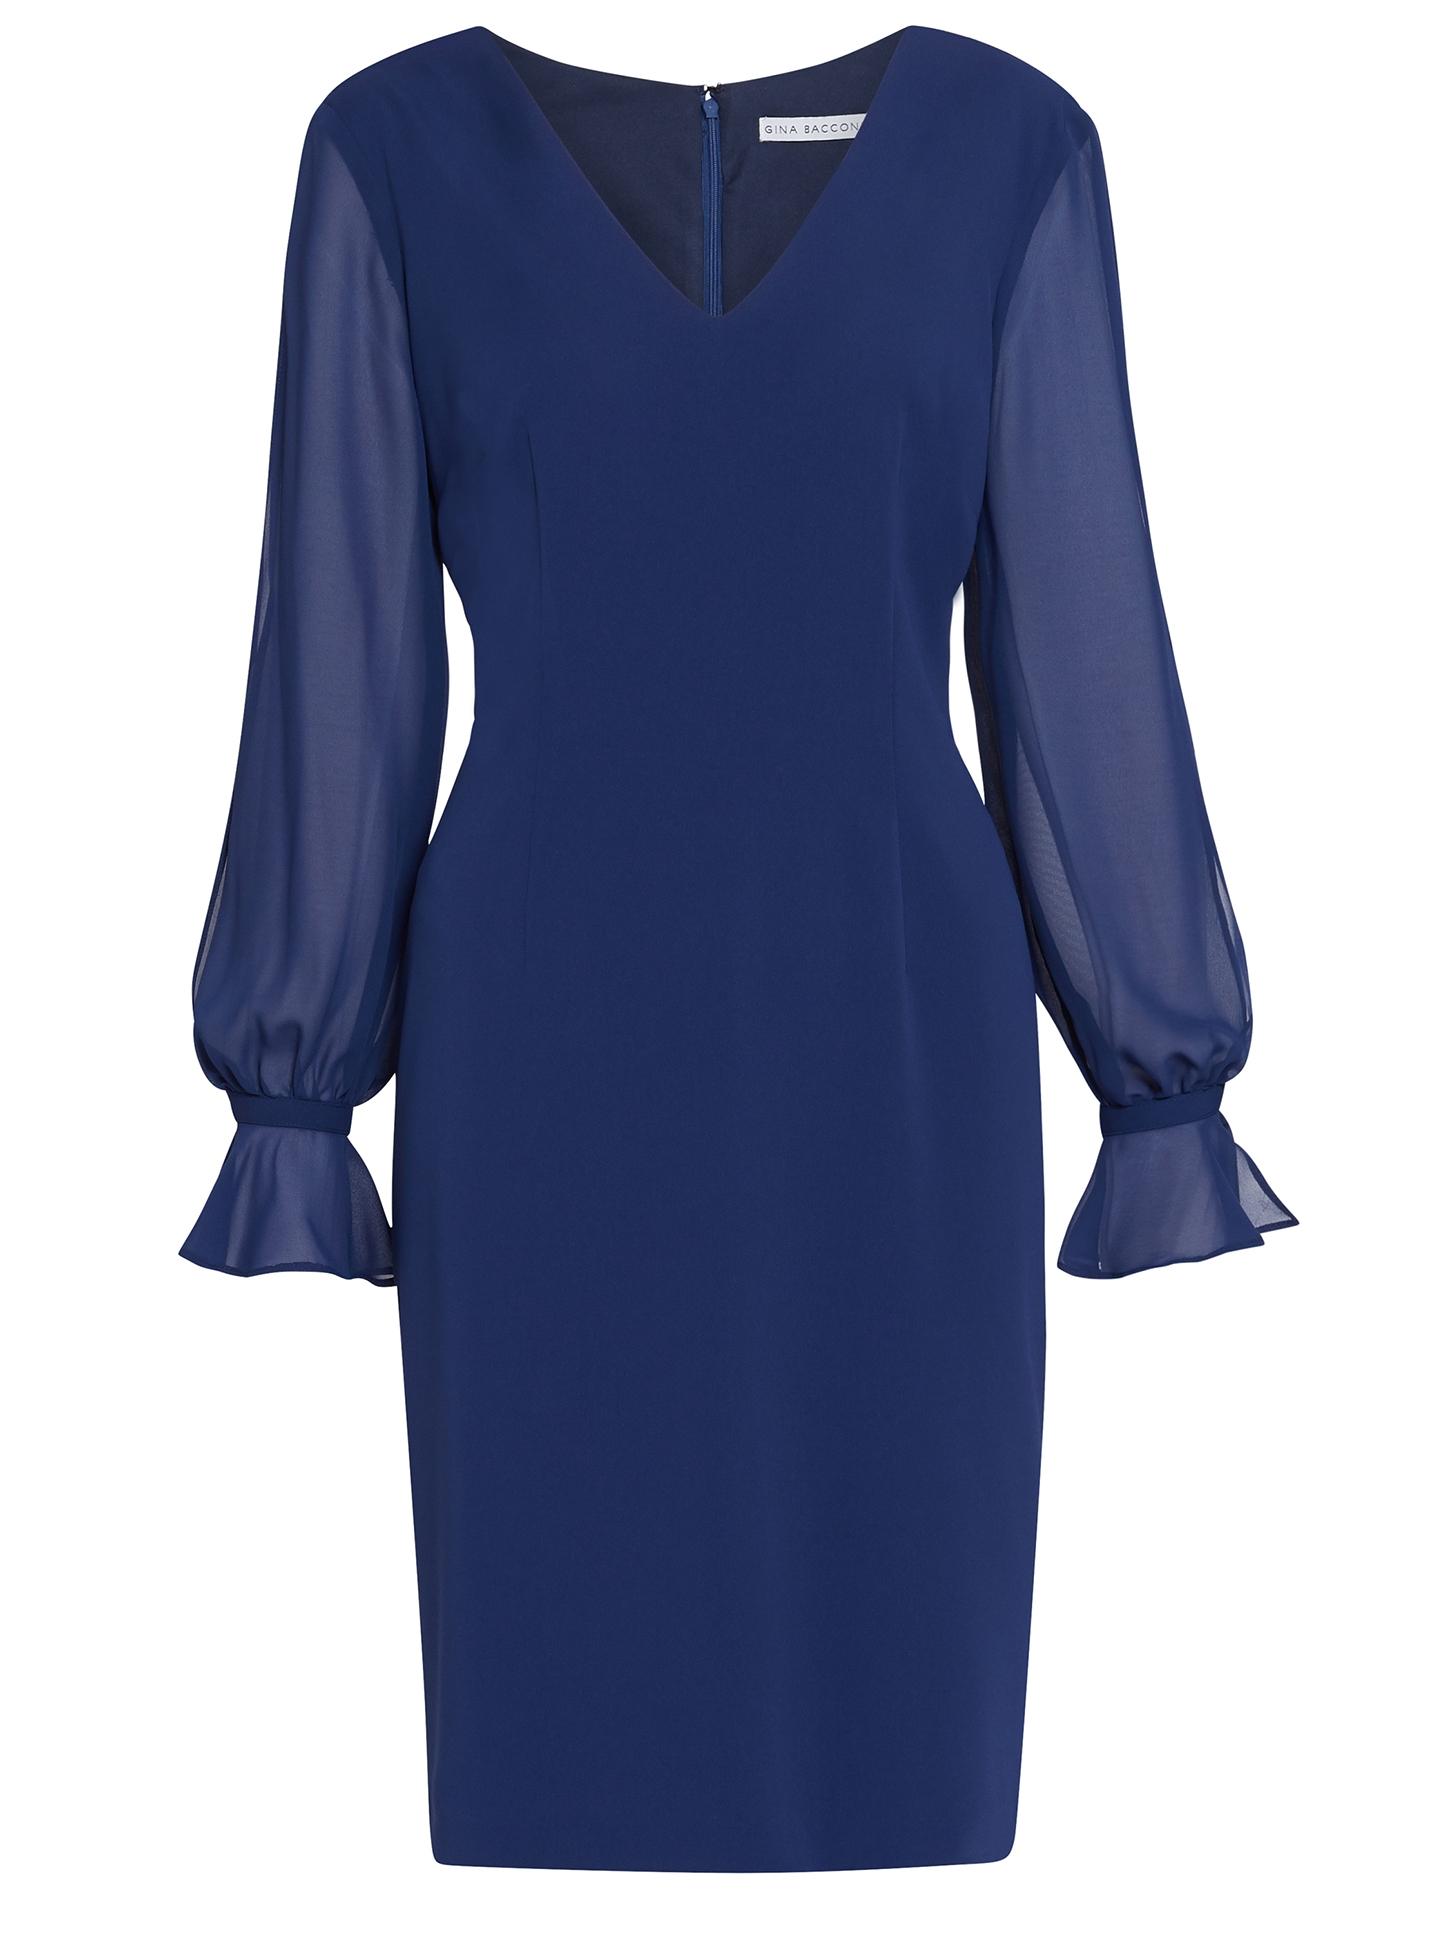 Luvia Crepe Dress With Chiffon Sleeves